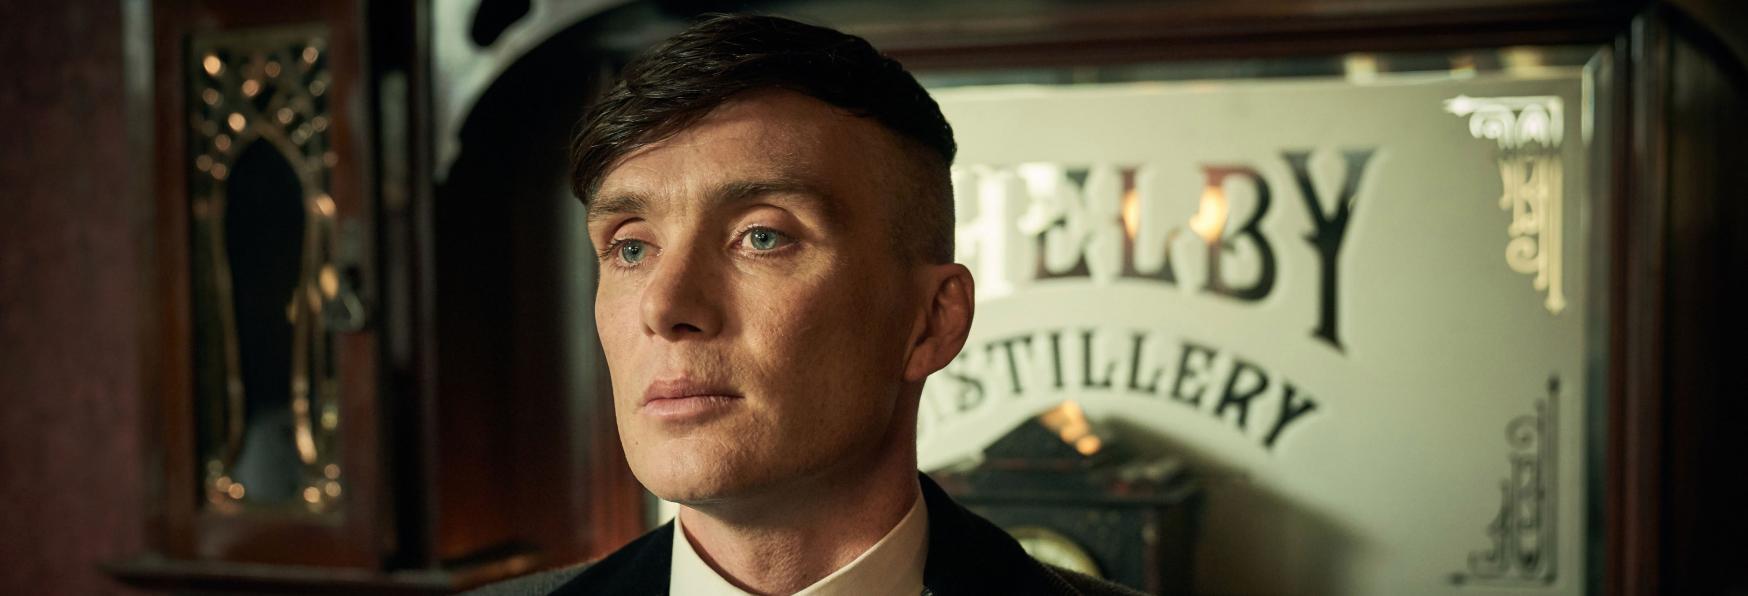 Peaky Blinders: Recensione della famosa Serie TV Inglese targata BBC